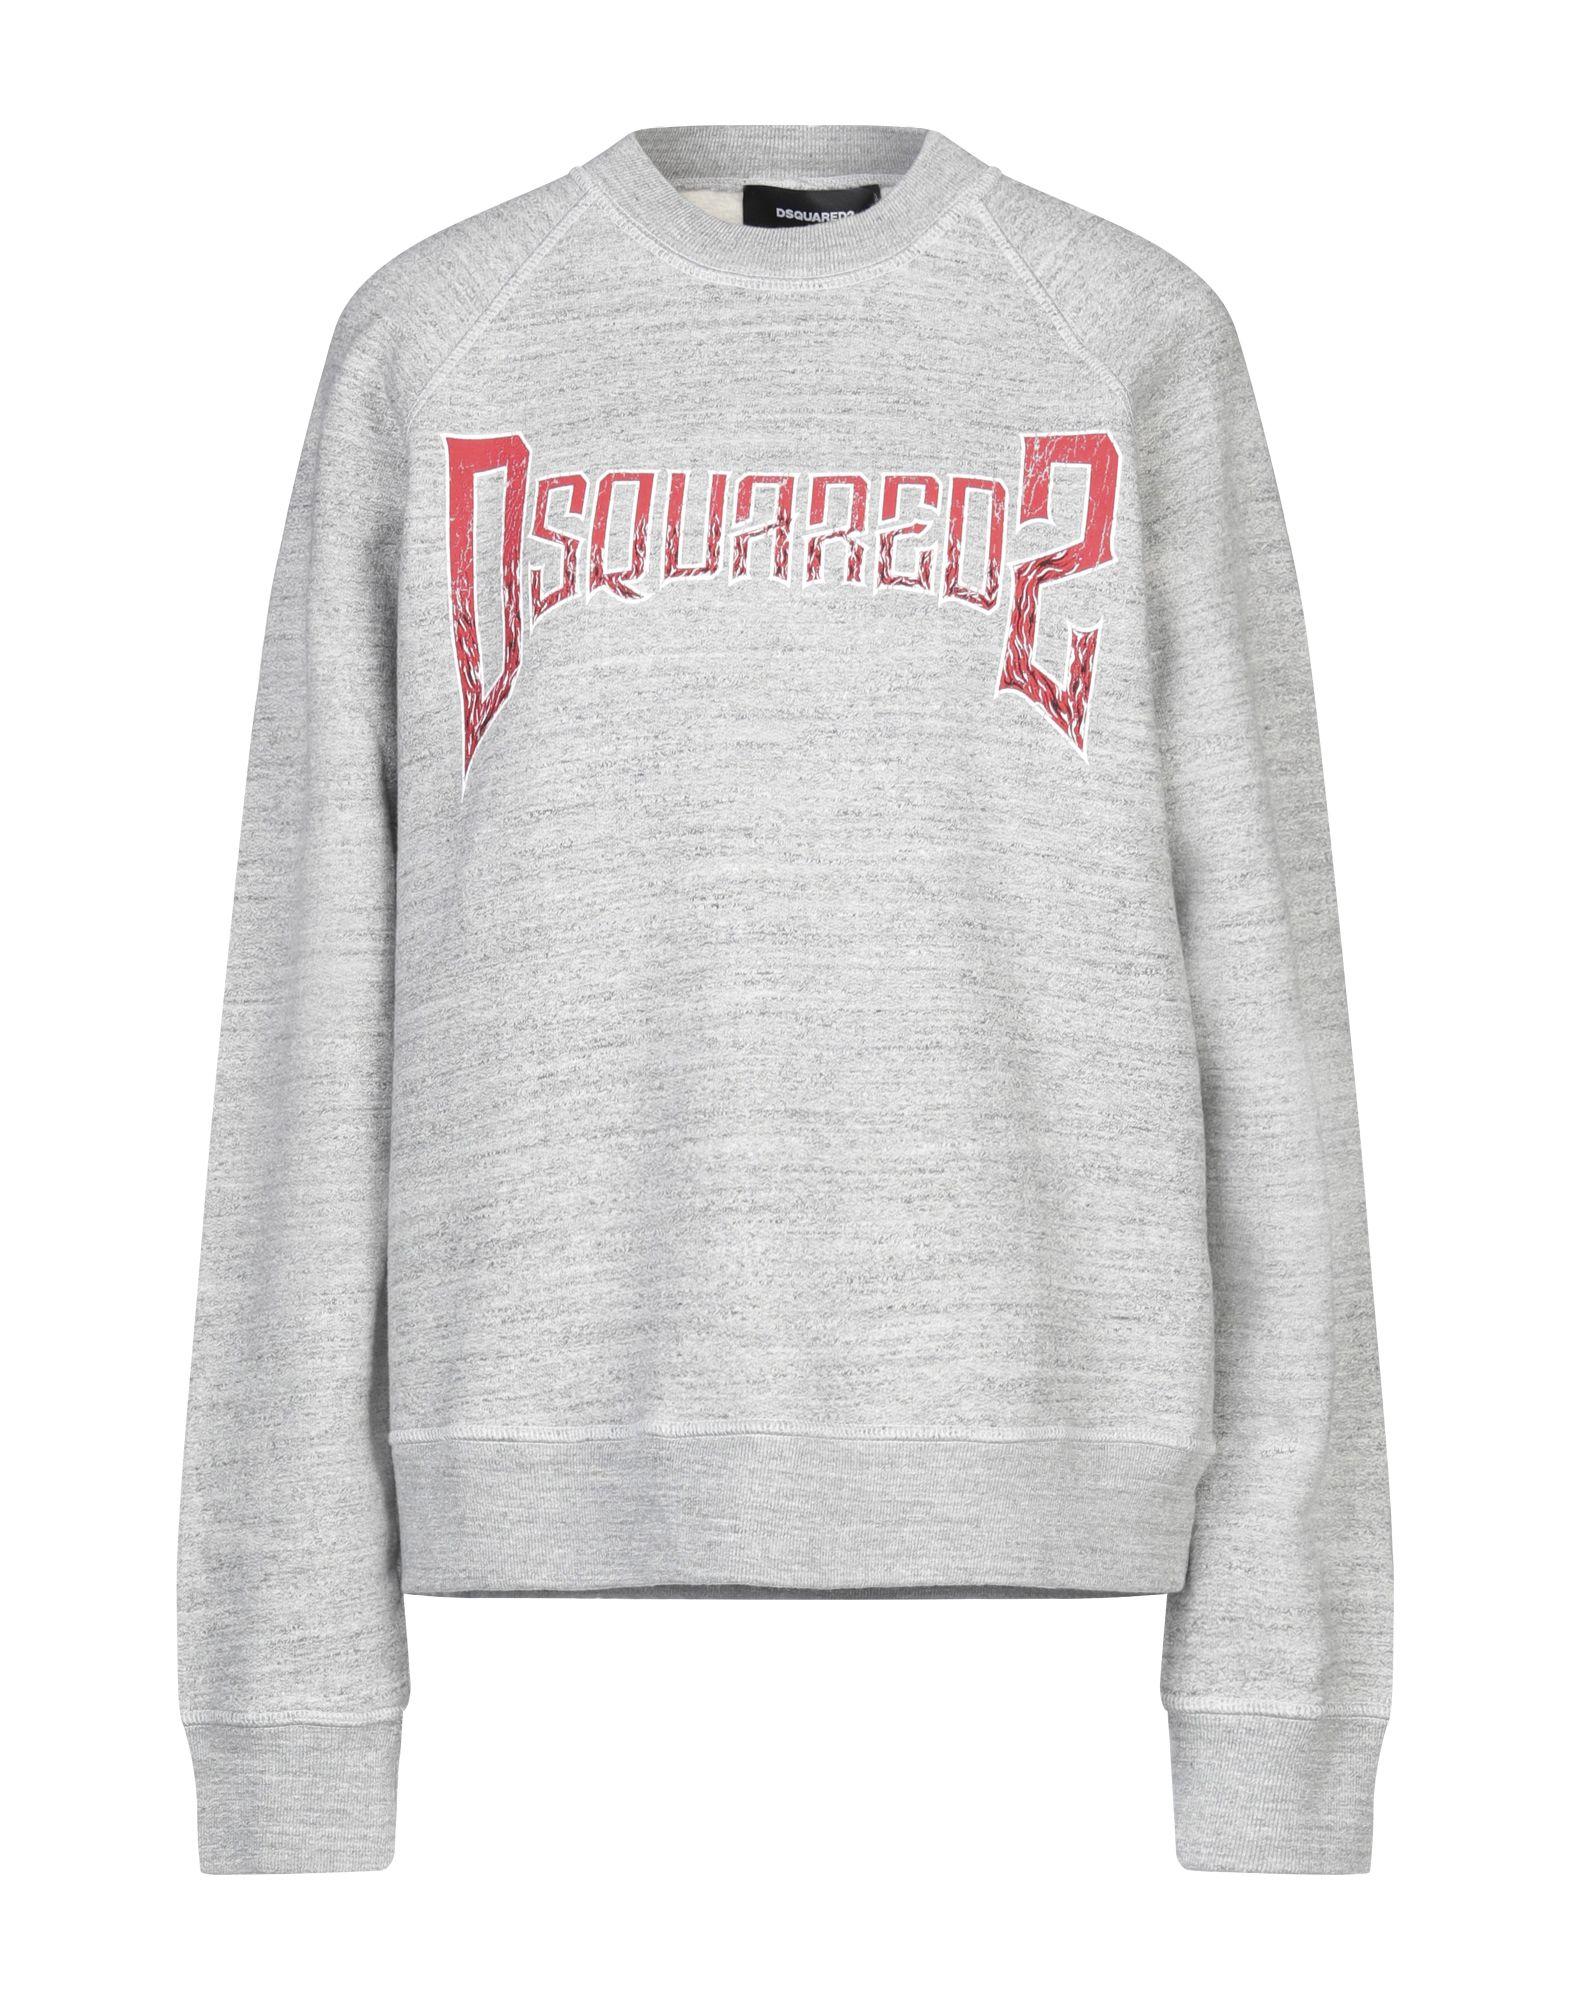 DSQUARED2 Sweatshirts - Item 12452637